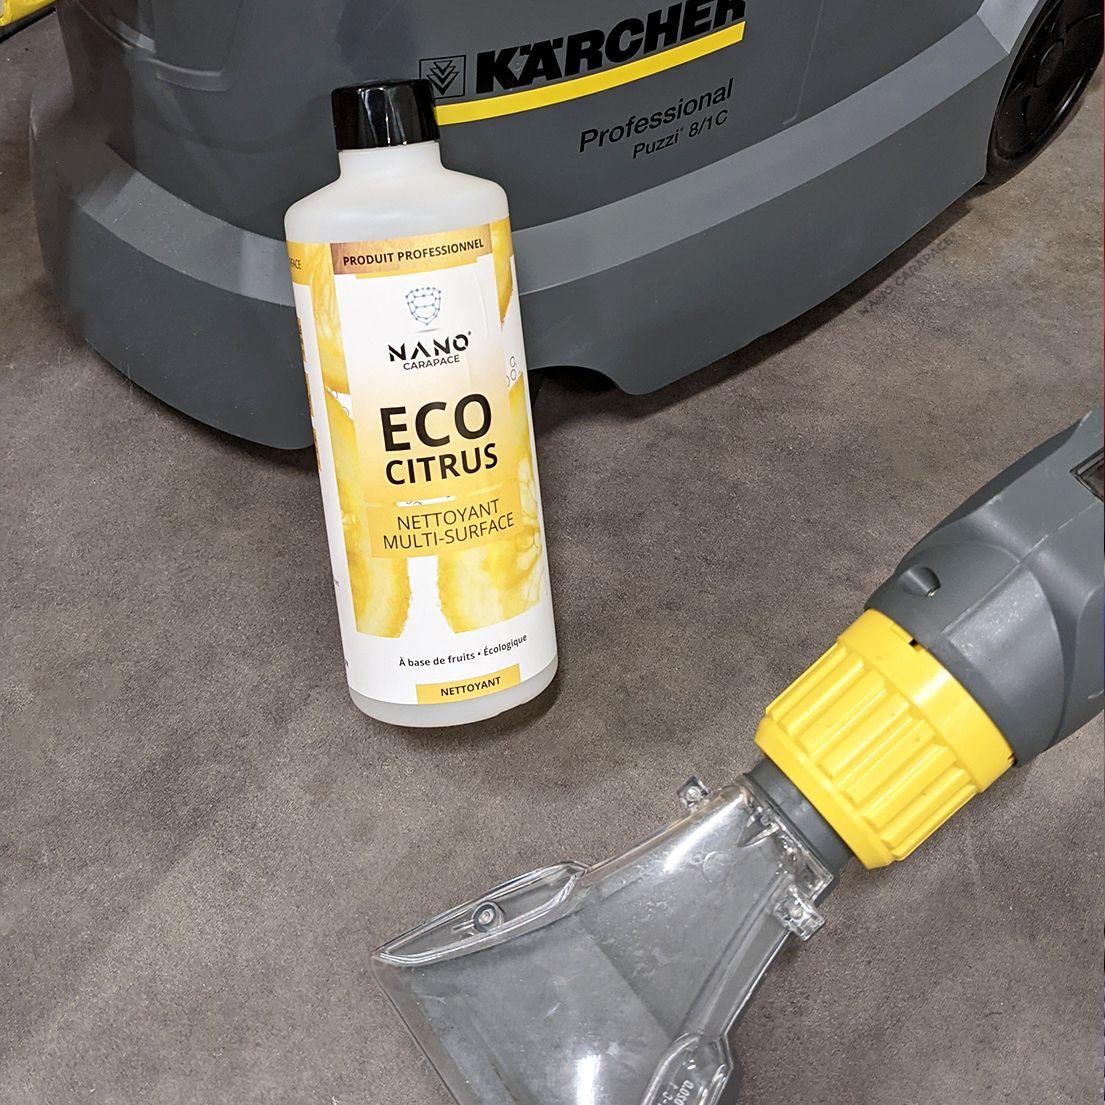 APC Nettoyant Multi-Surface - Eco Citrus